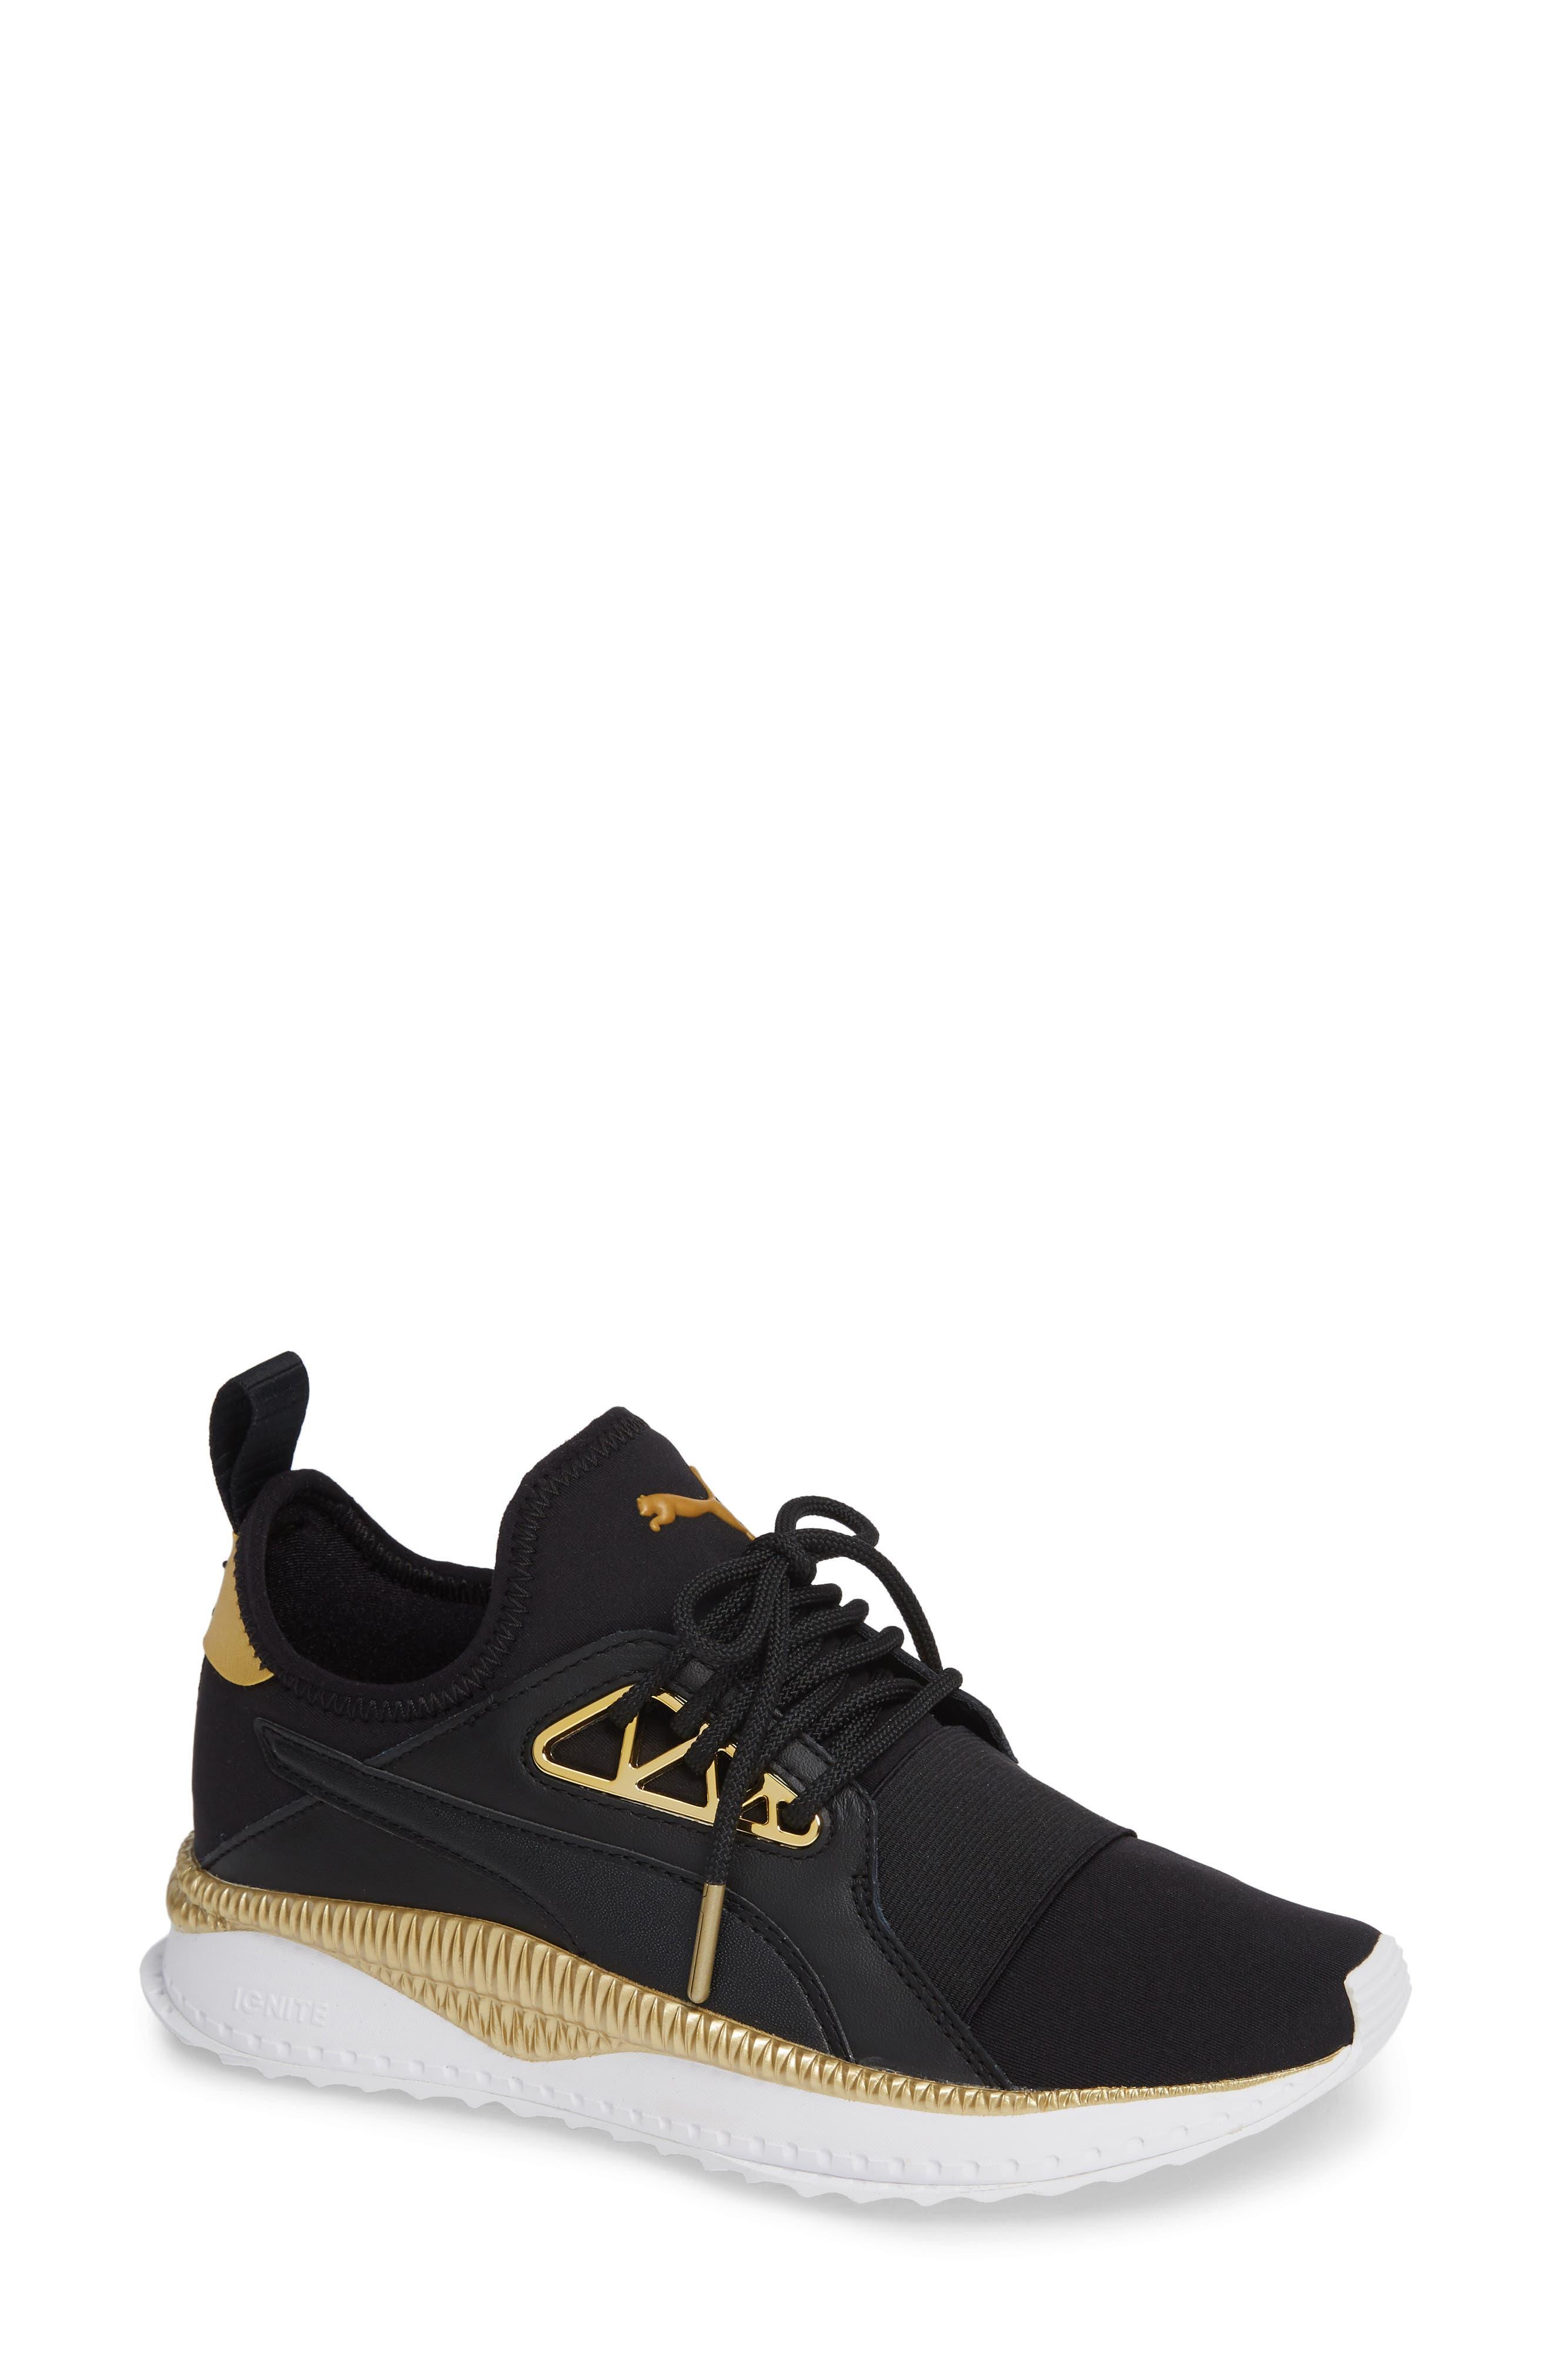 TSUGI Apex Jewel Sneaker,                         Main,                         color, PUMA BLACK/ PUMA BLACK